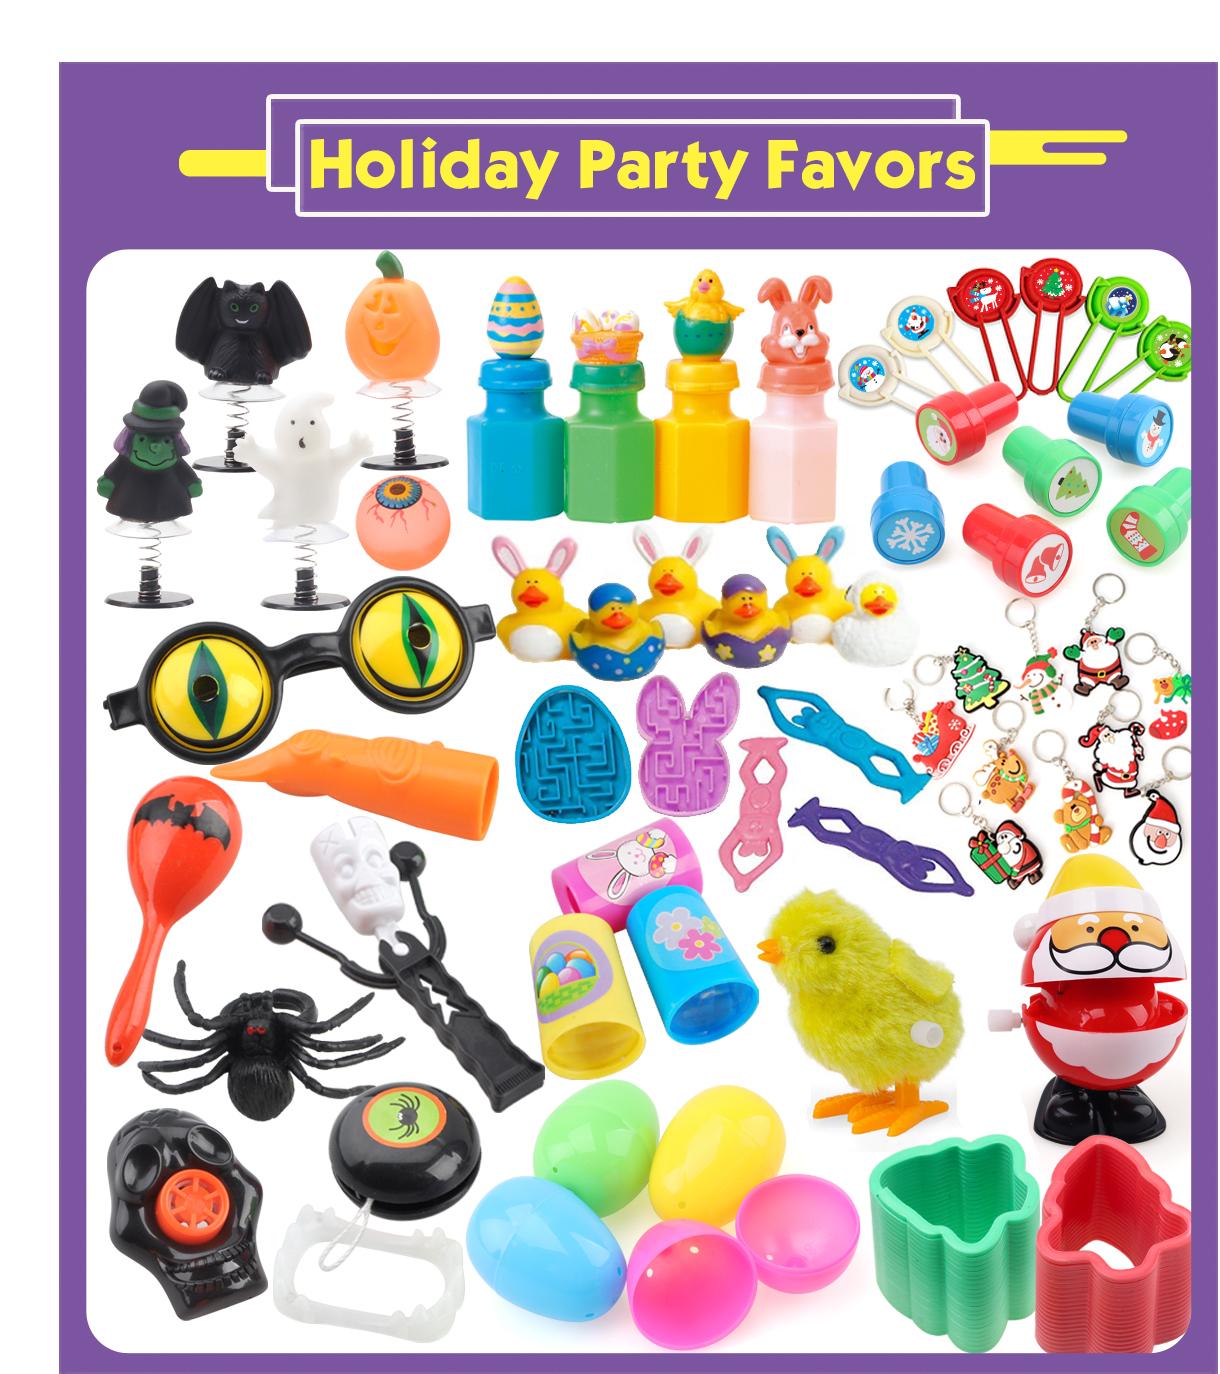 Wacky Whistles Birthday Party Favor Gift Toy Boys Girls Fun Novelty Clown